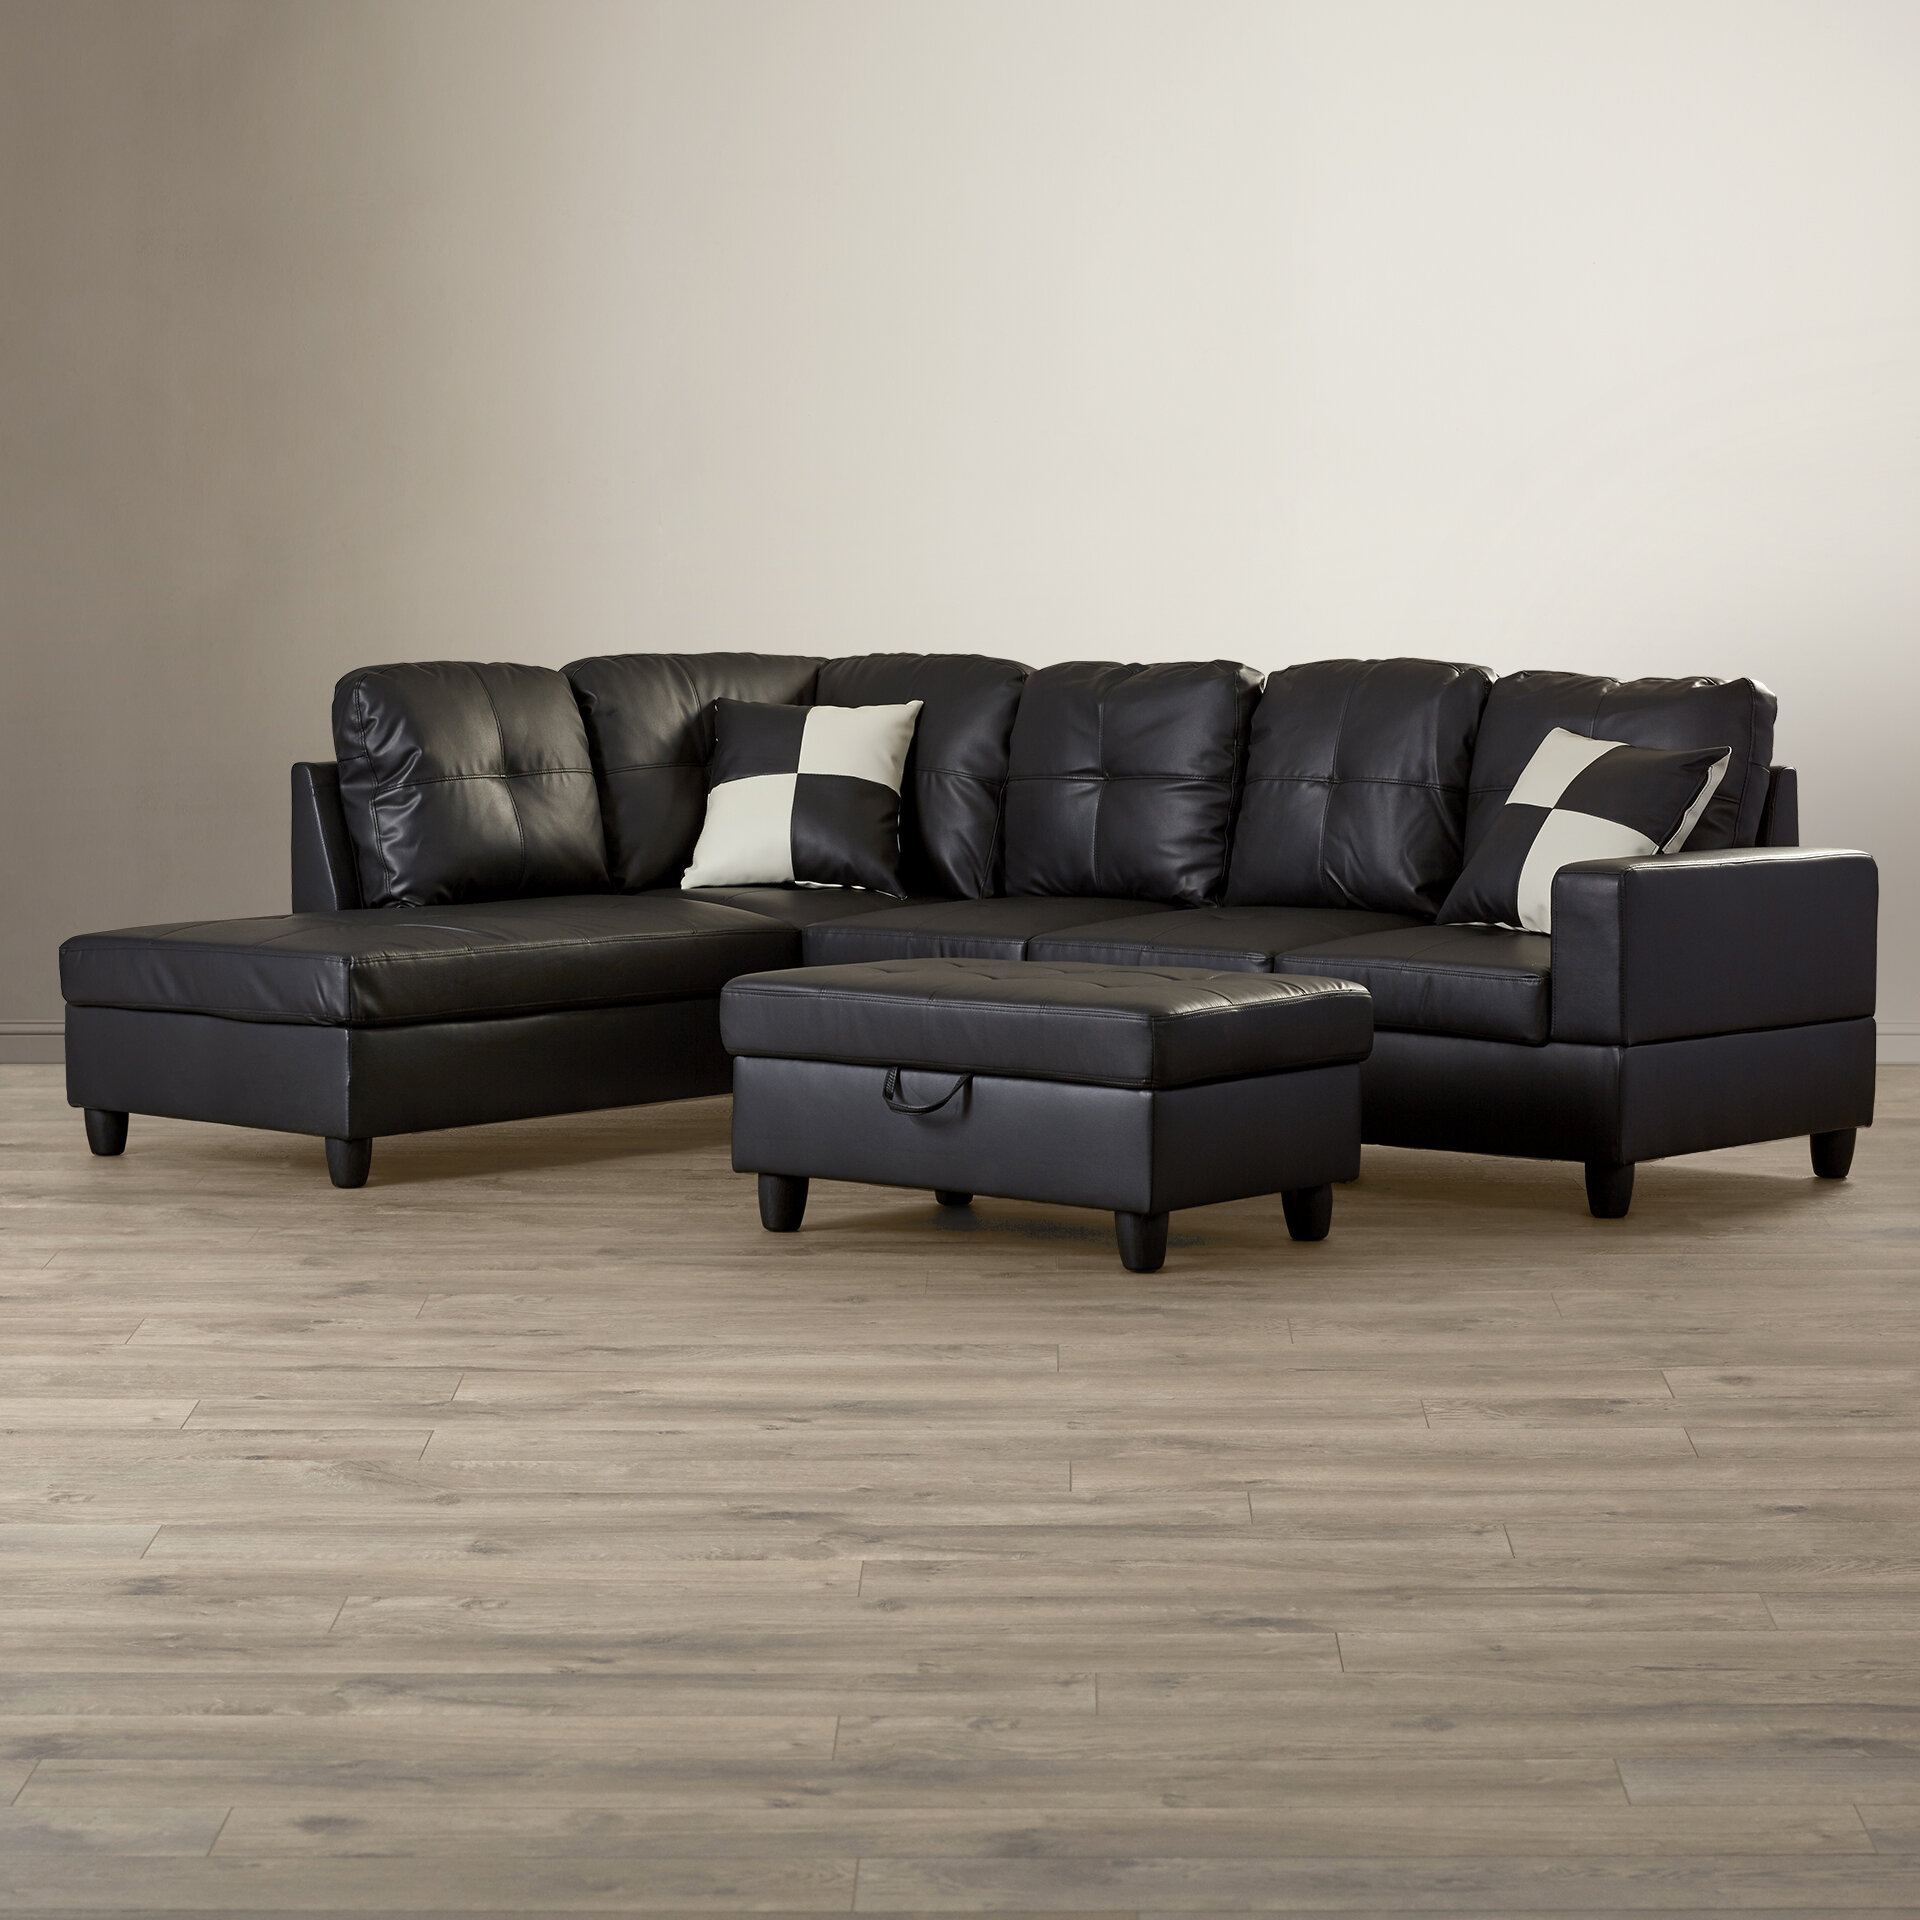 Marvelous Slim Leather Attache Cases Wayfair Unemploymentrelief Wooden Chair Designs For Living Room Unemploymentrelieforg